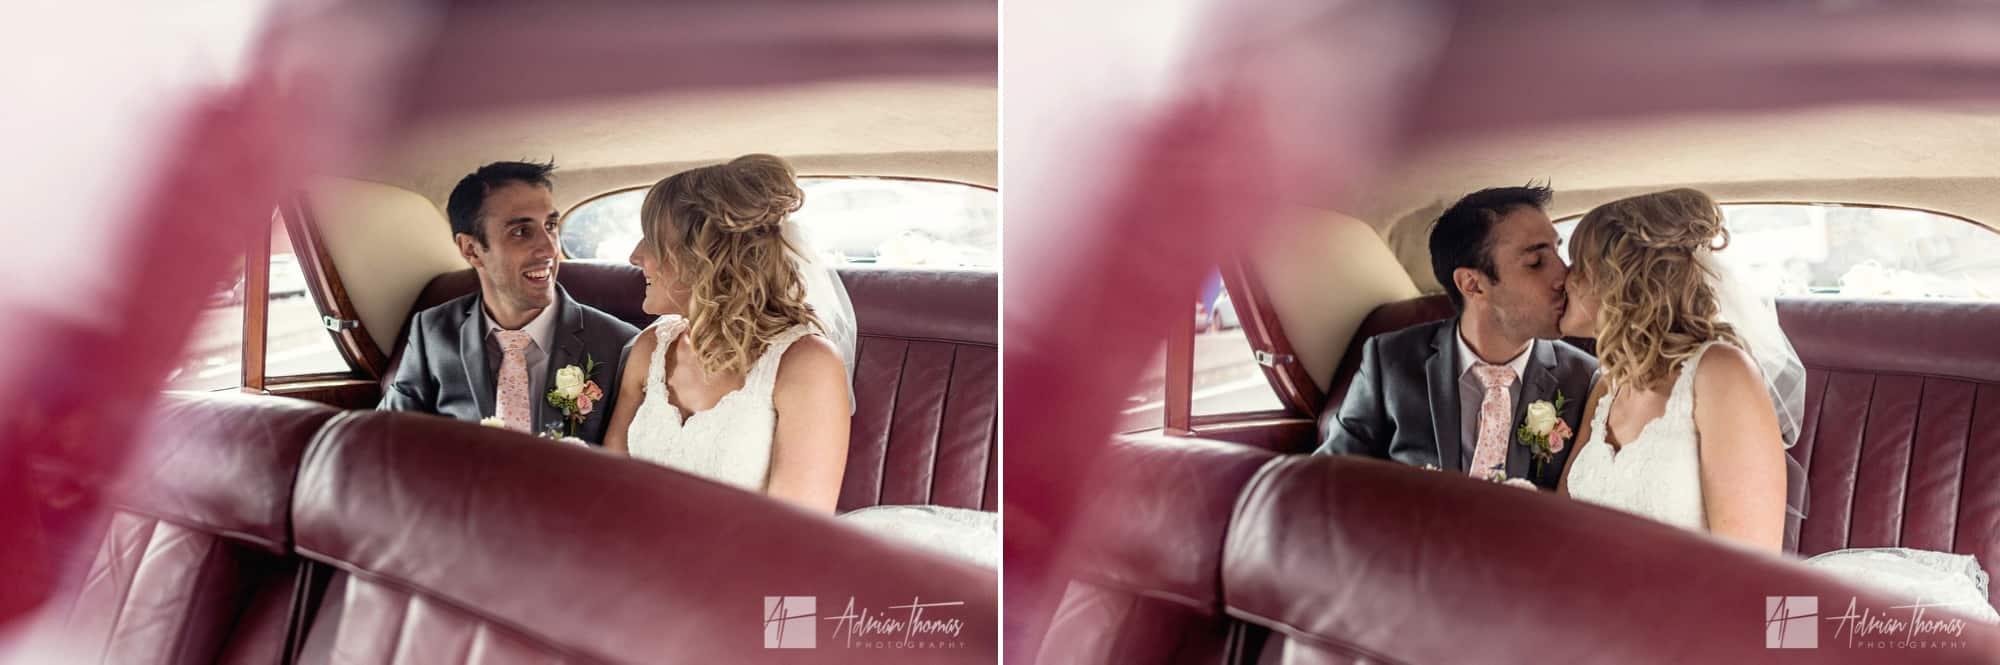 Bride and groom in wedding car.